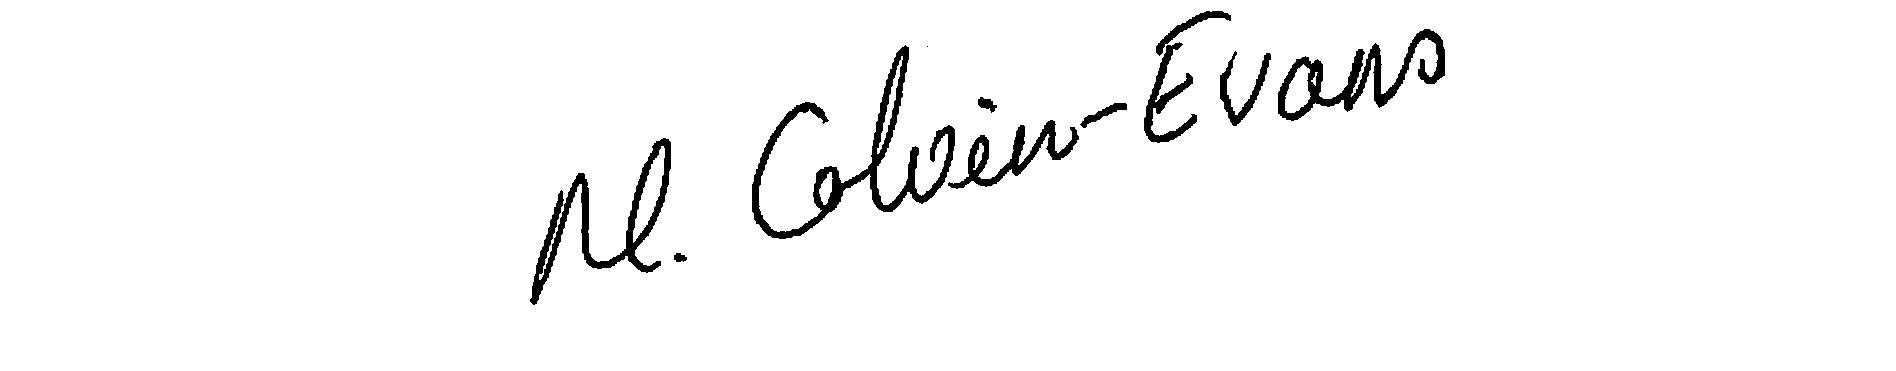 Moya Colvin-Evans Signature